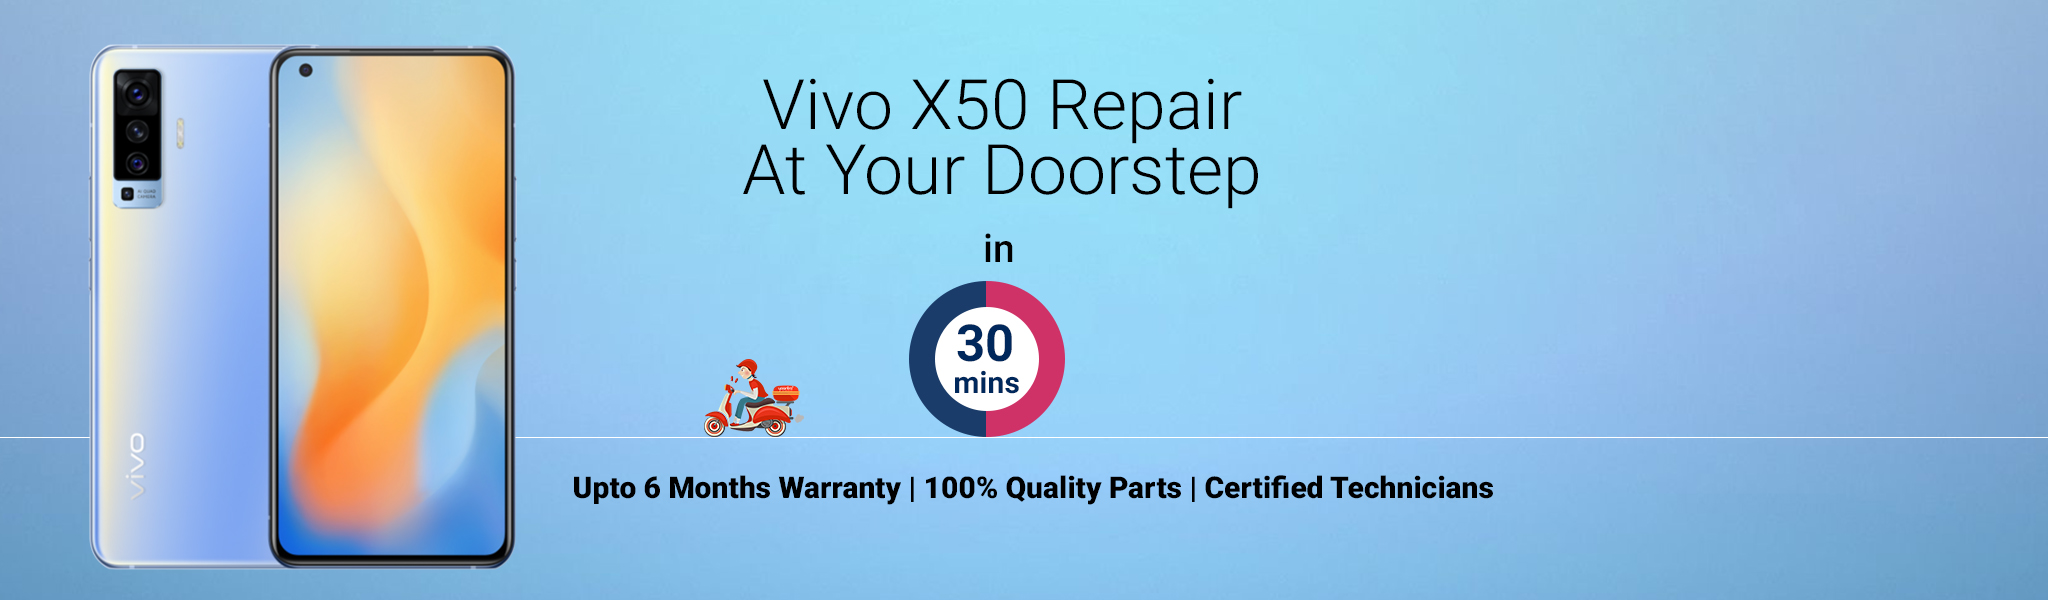 vivo-x50-repair.jpg